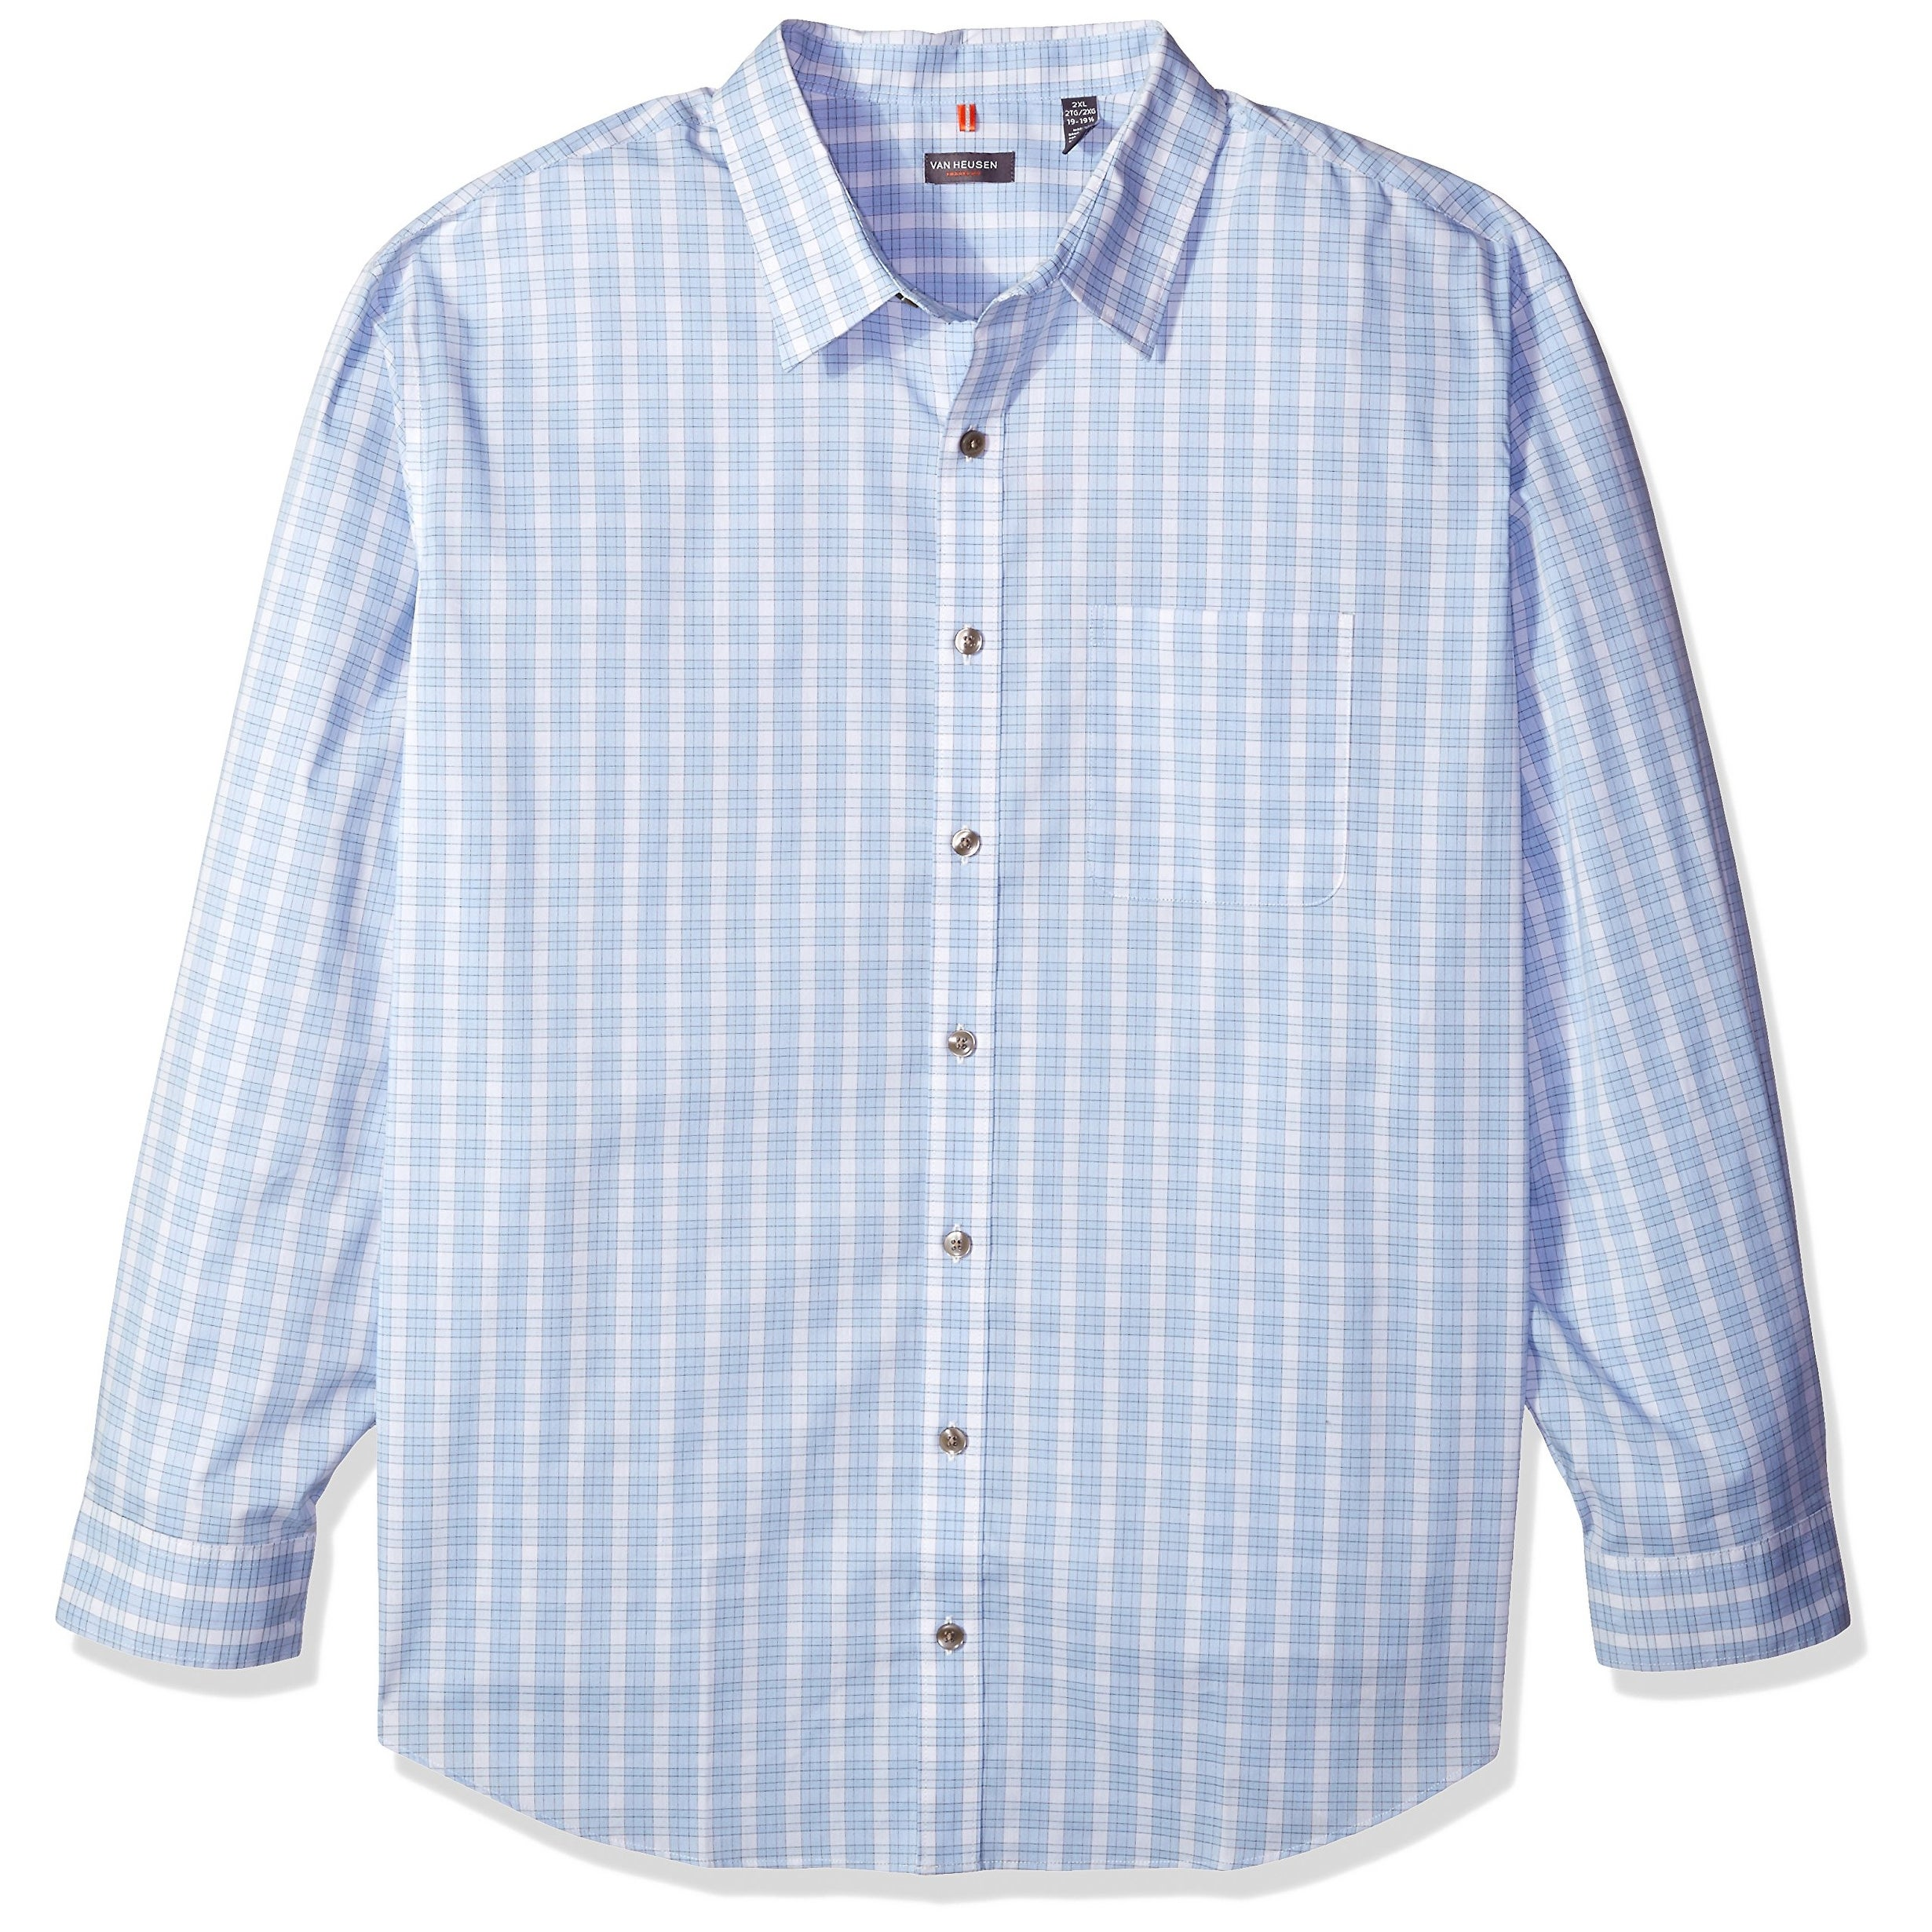 2482ea424673f1 Van Heusen Men's Clothing | Shop our Best Clothing & Shoes Deals Online at  Overstock